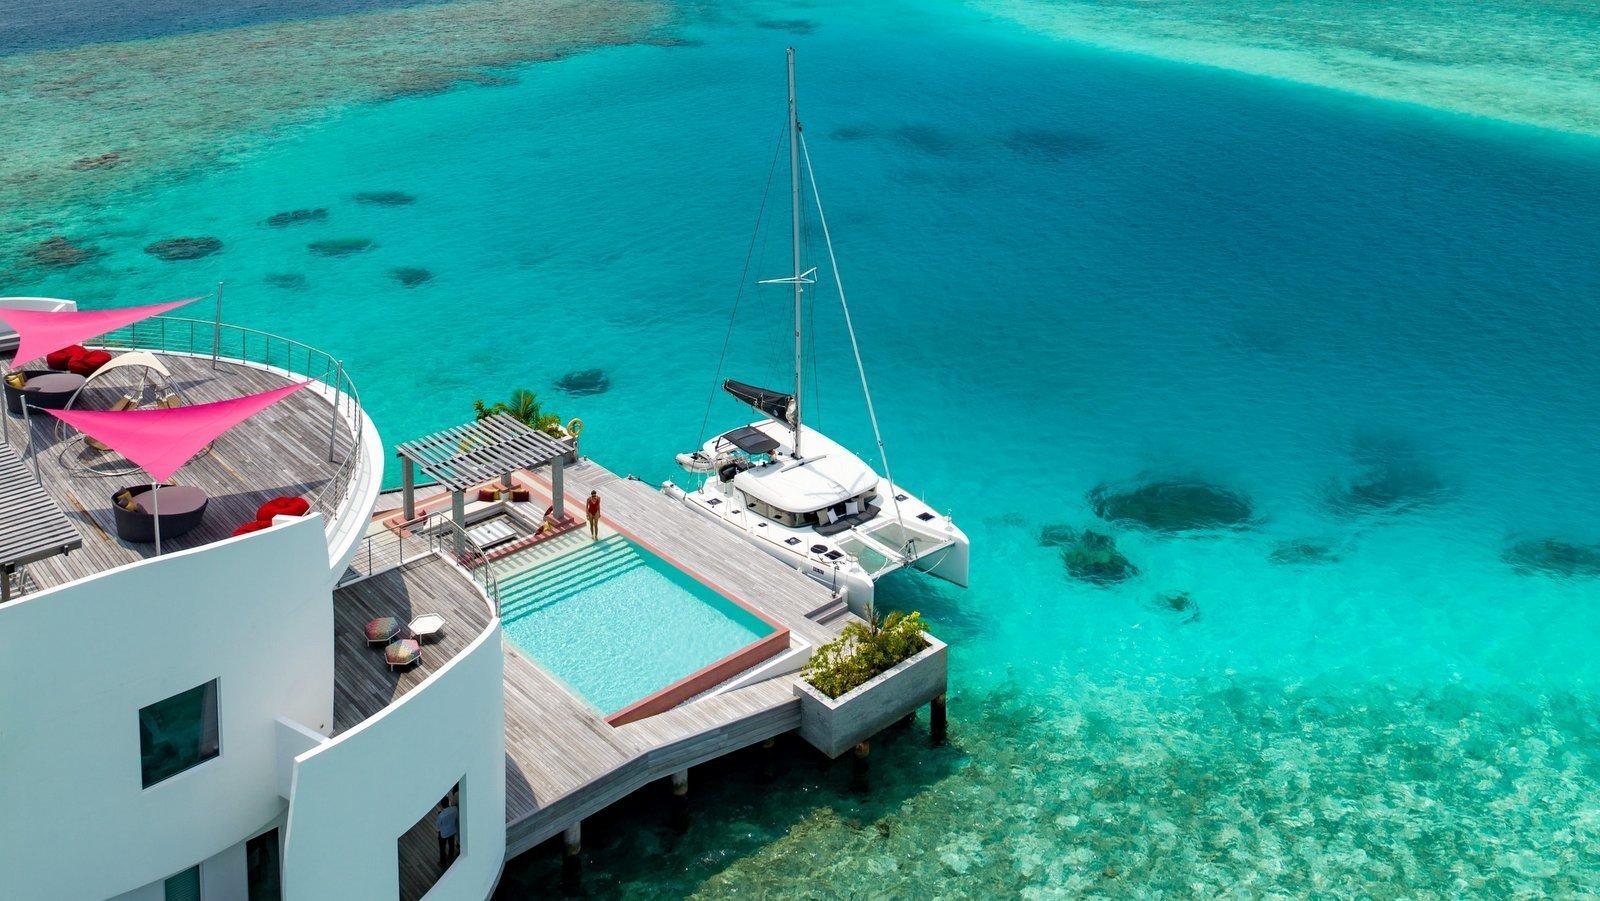 Мальдивы, отель LUX North Male Atoll, номер LUX* Overwater Retreat 3 Bedroom